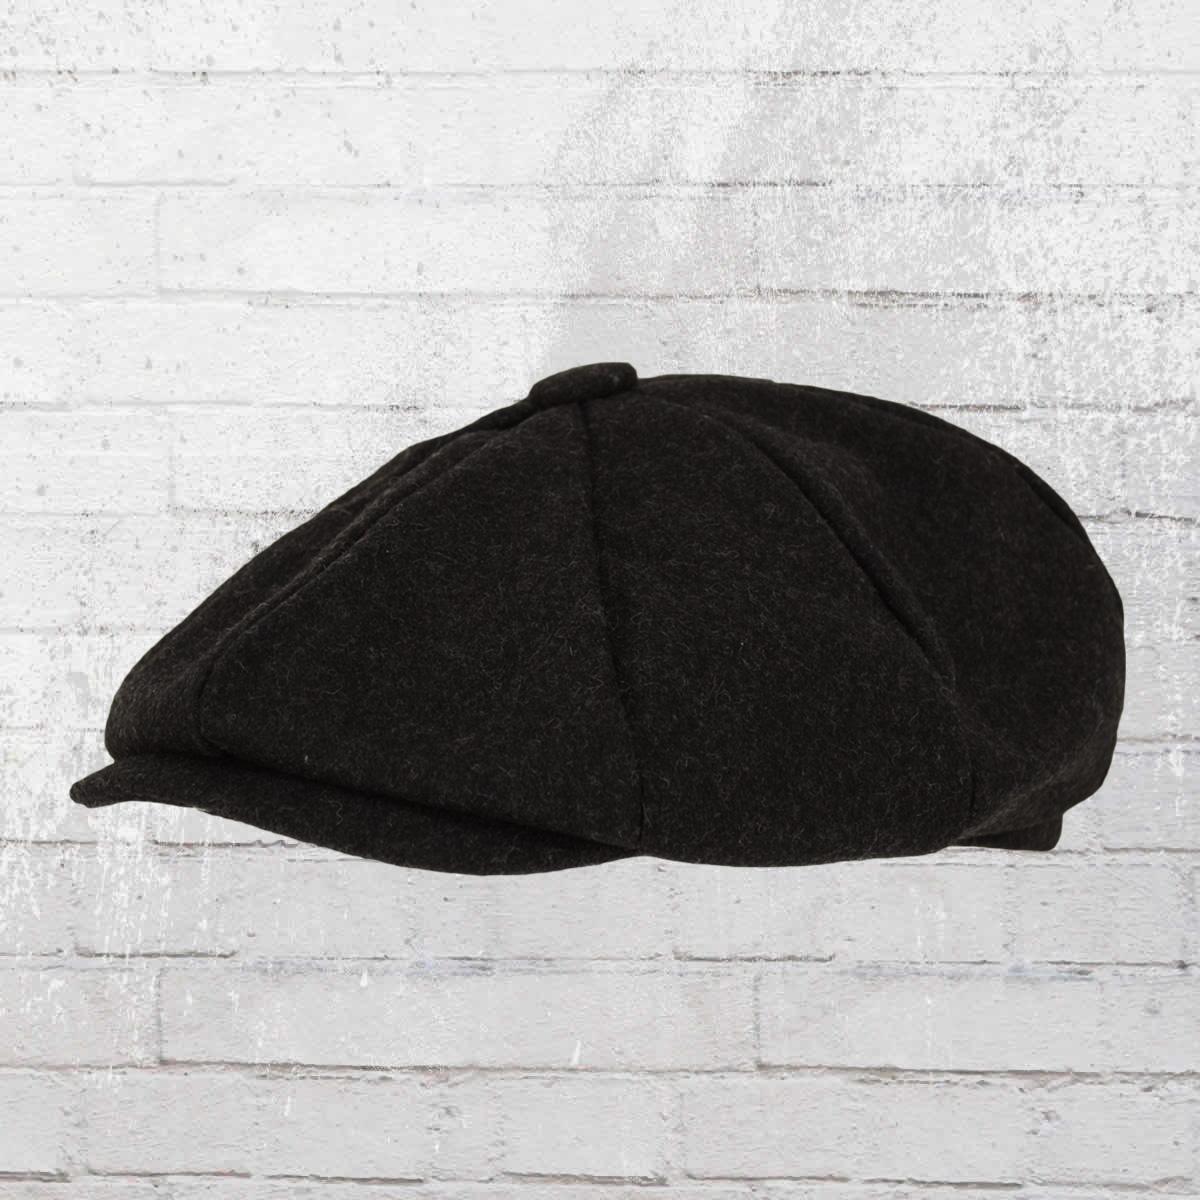 dbcc68fbcb4 Beechfield Melton Wool Baker Boy Newsboy Cap black. ›‹ «